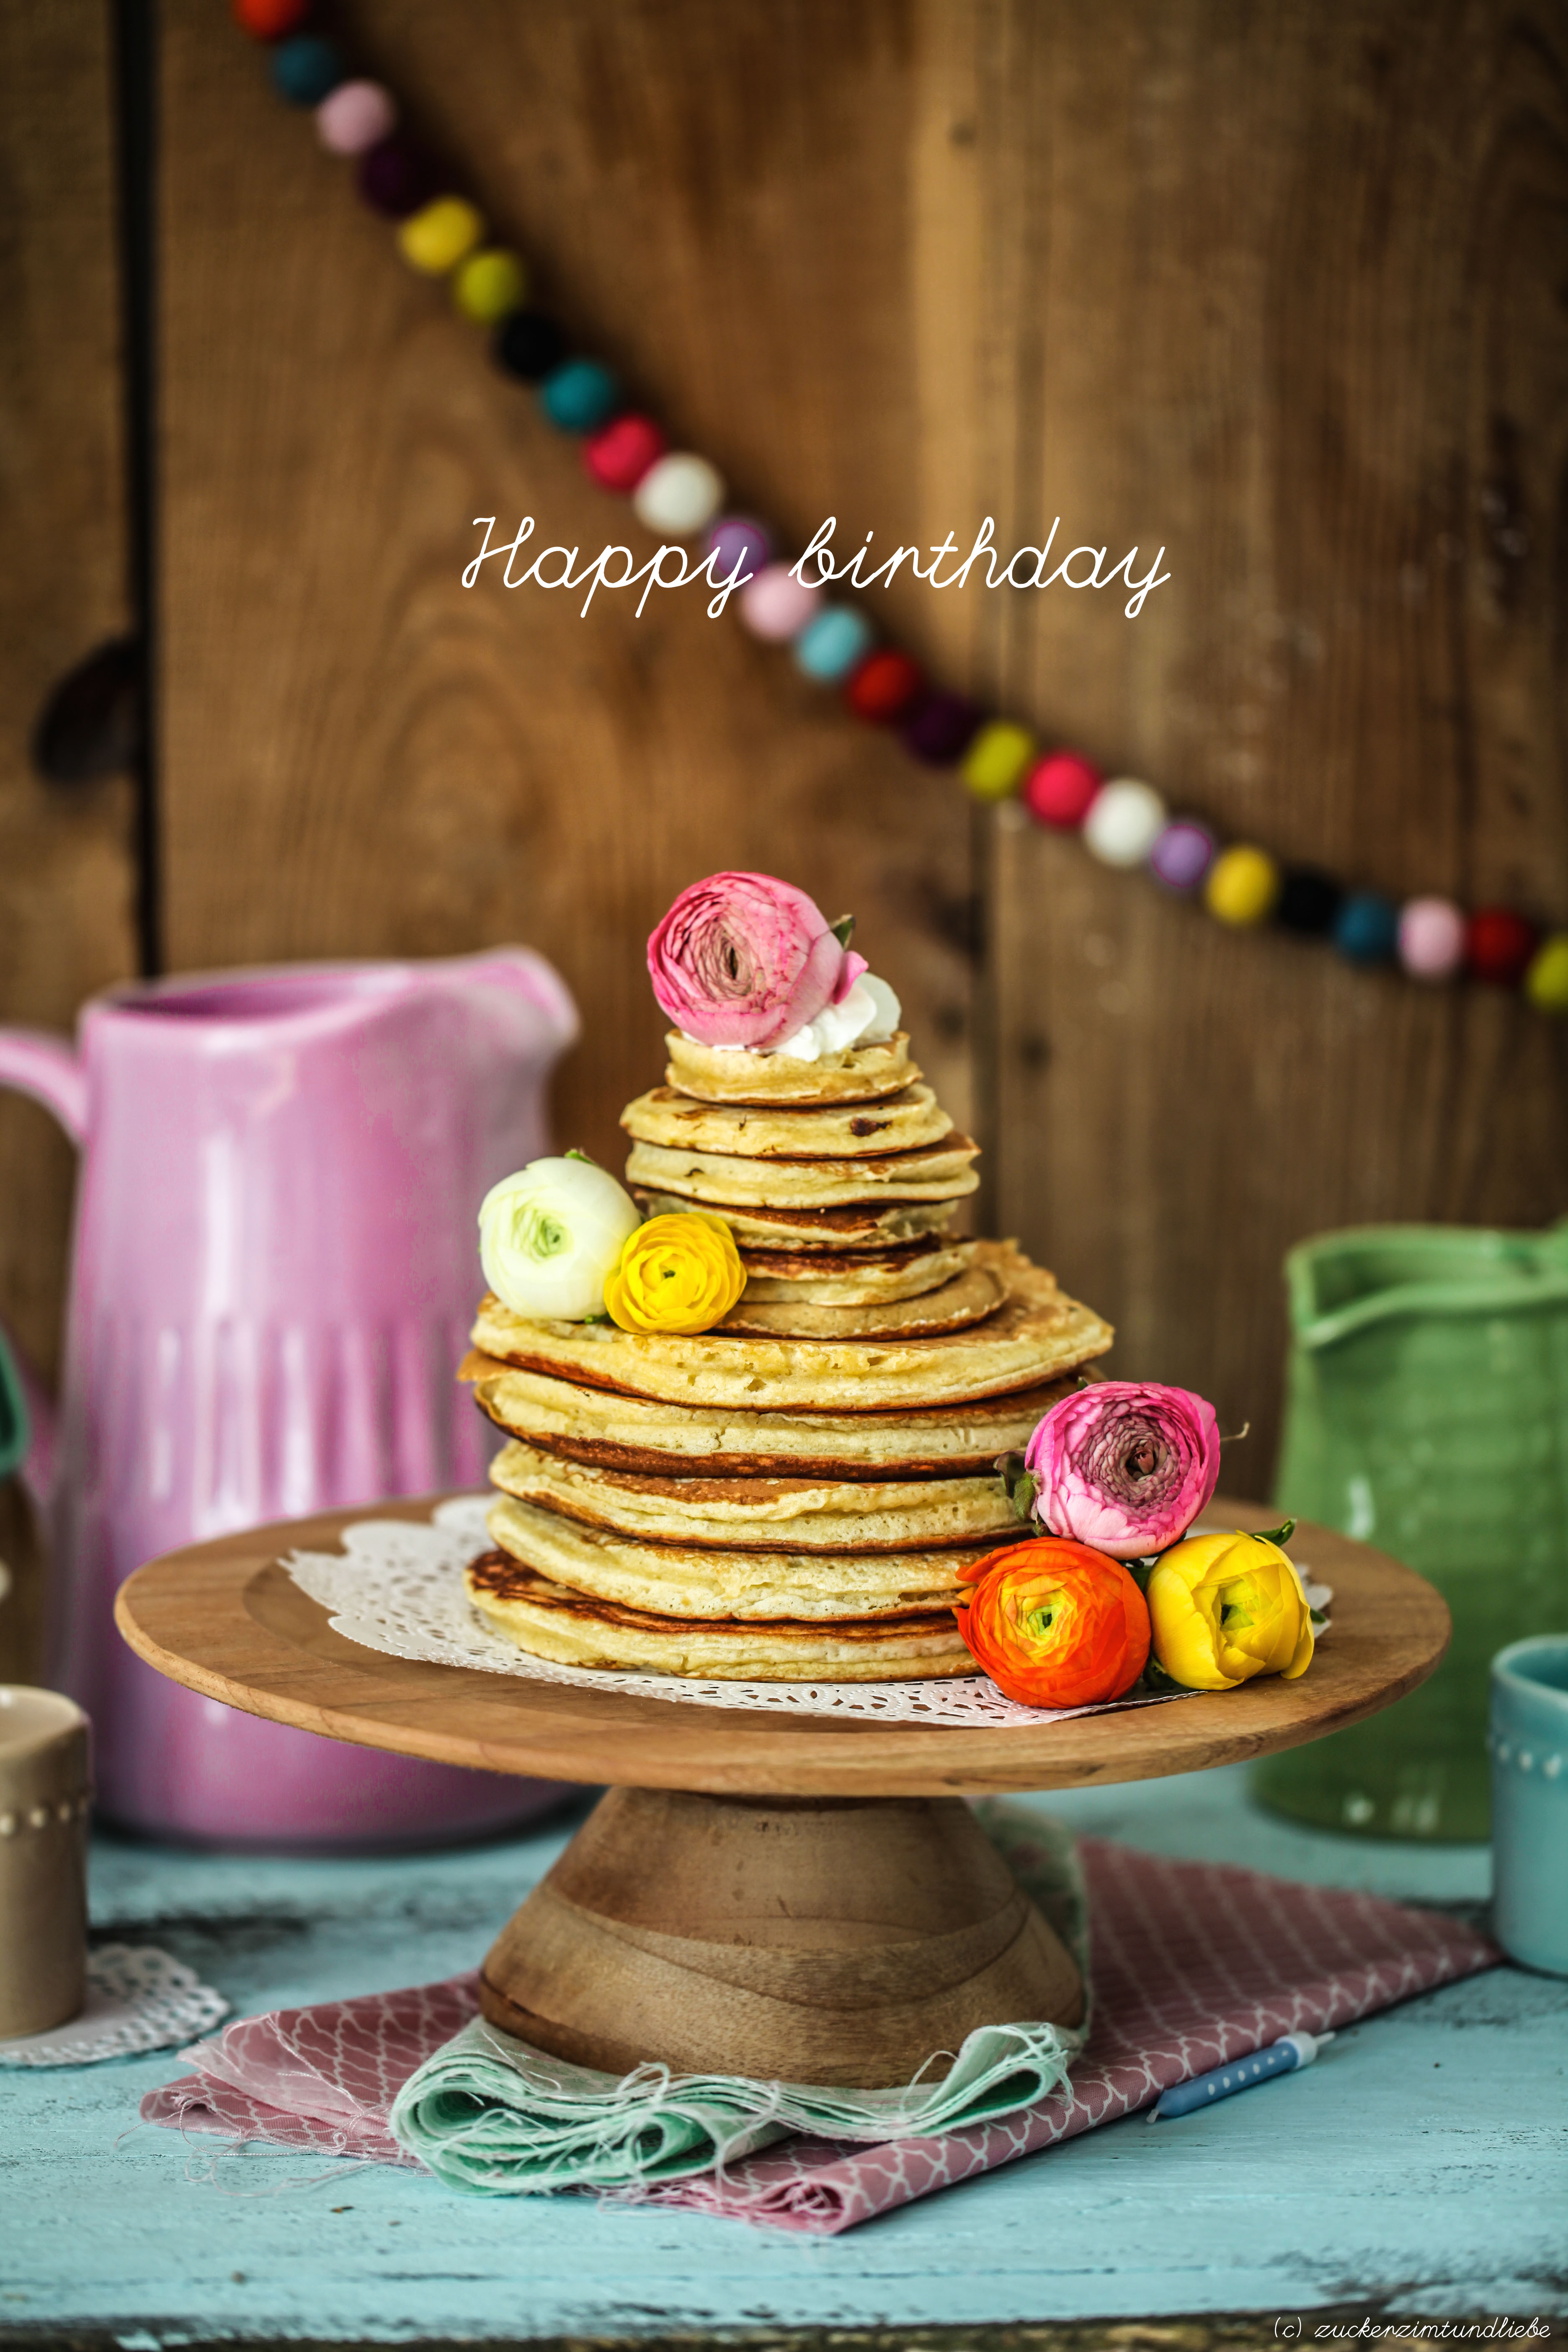 Zuckerzimtundliebe Rezept Zitronen Buttermilch Pancakes Geburtstagstorte Lecker Weltrekord b